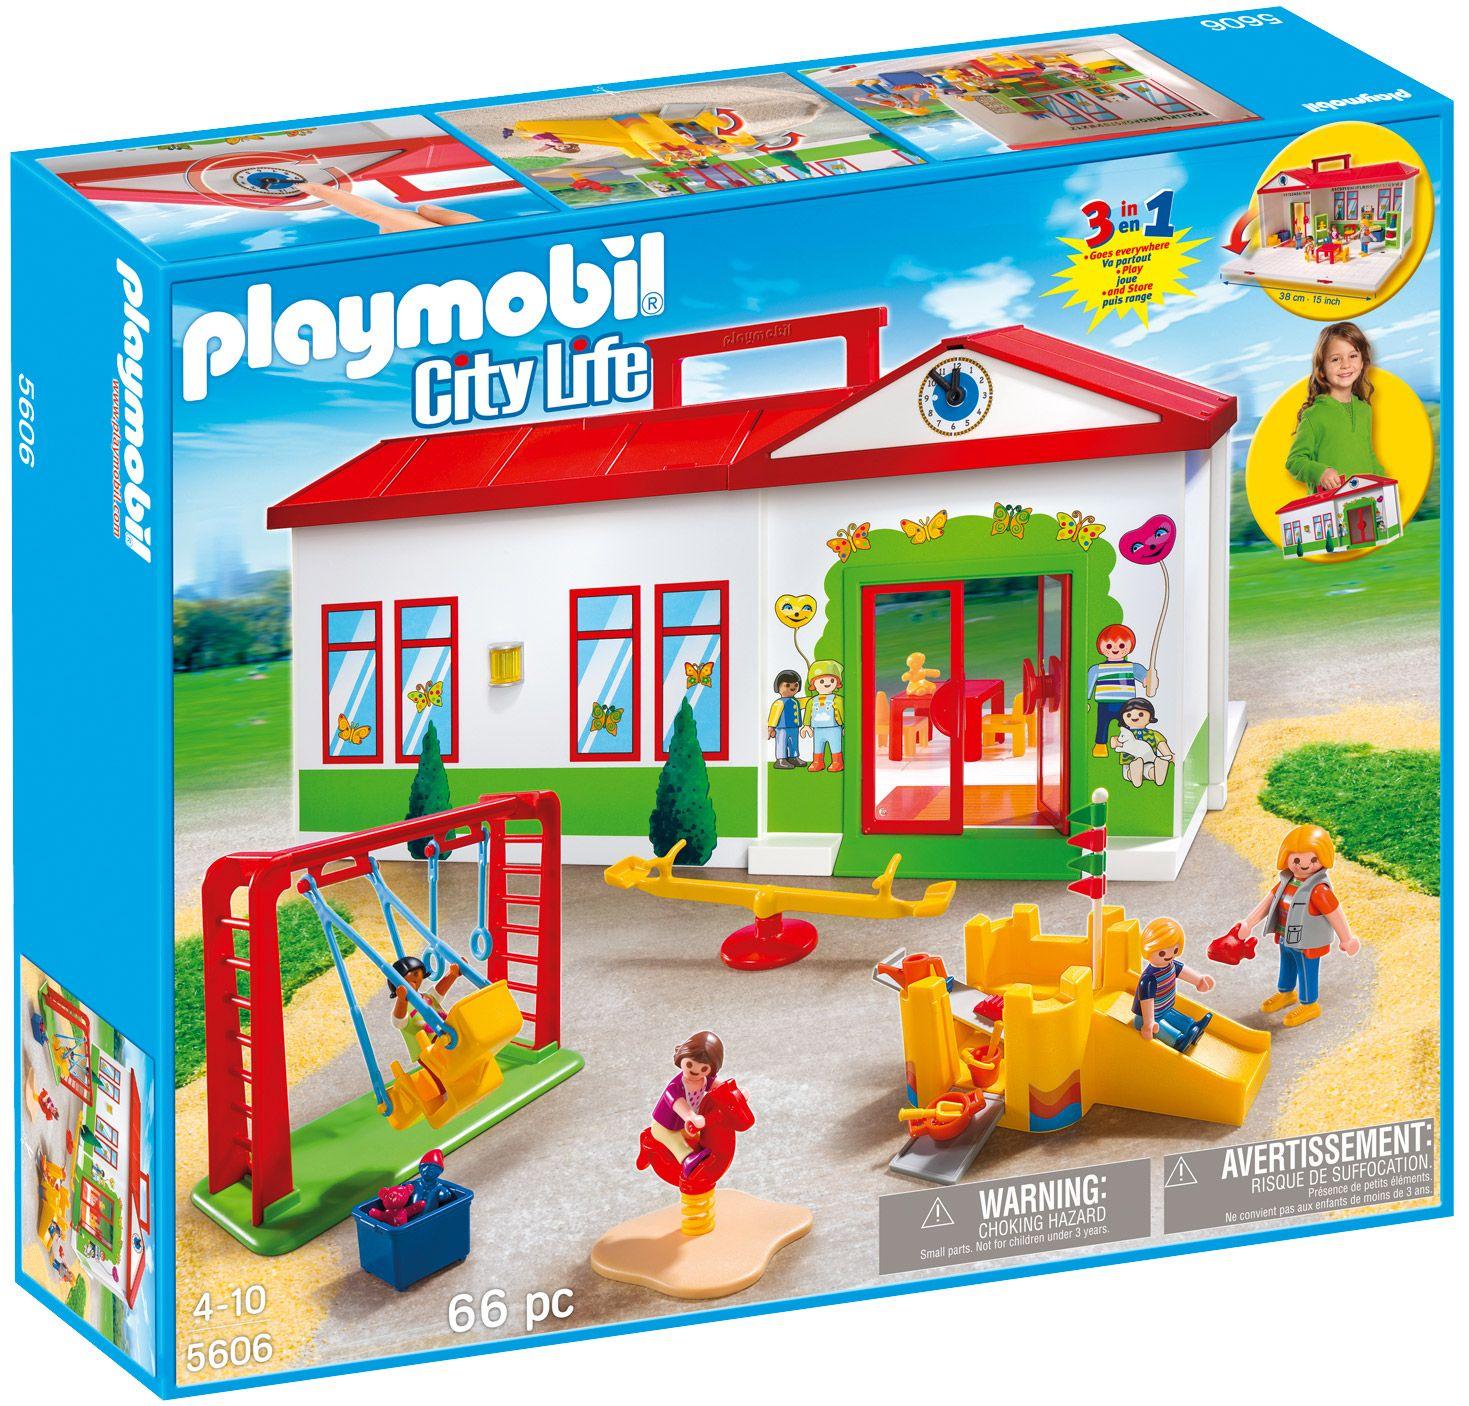 Playmobil City Life 5606 : La Garderie | Playmobil ... pour Playmobil Jardin D Enfant